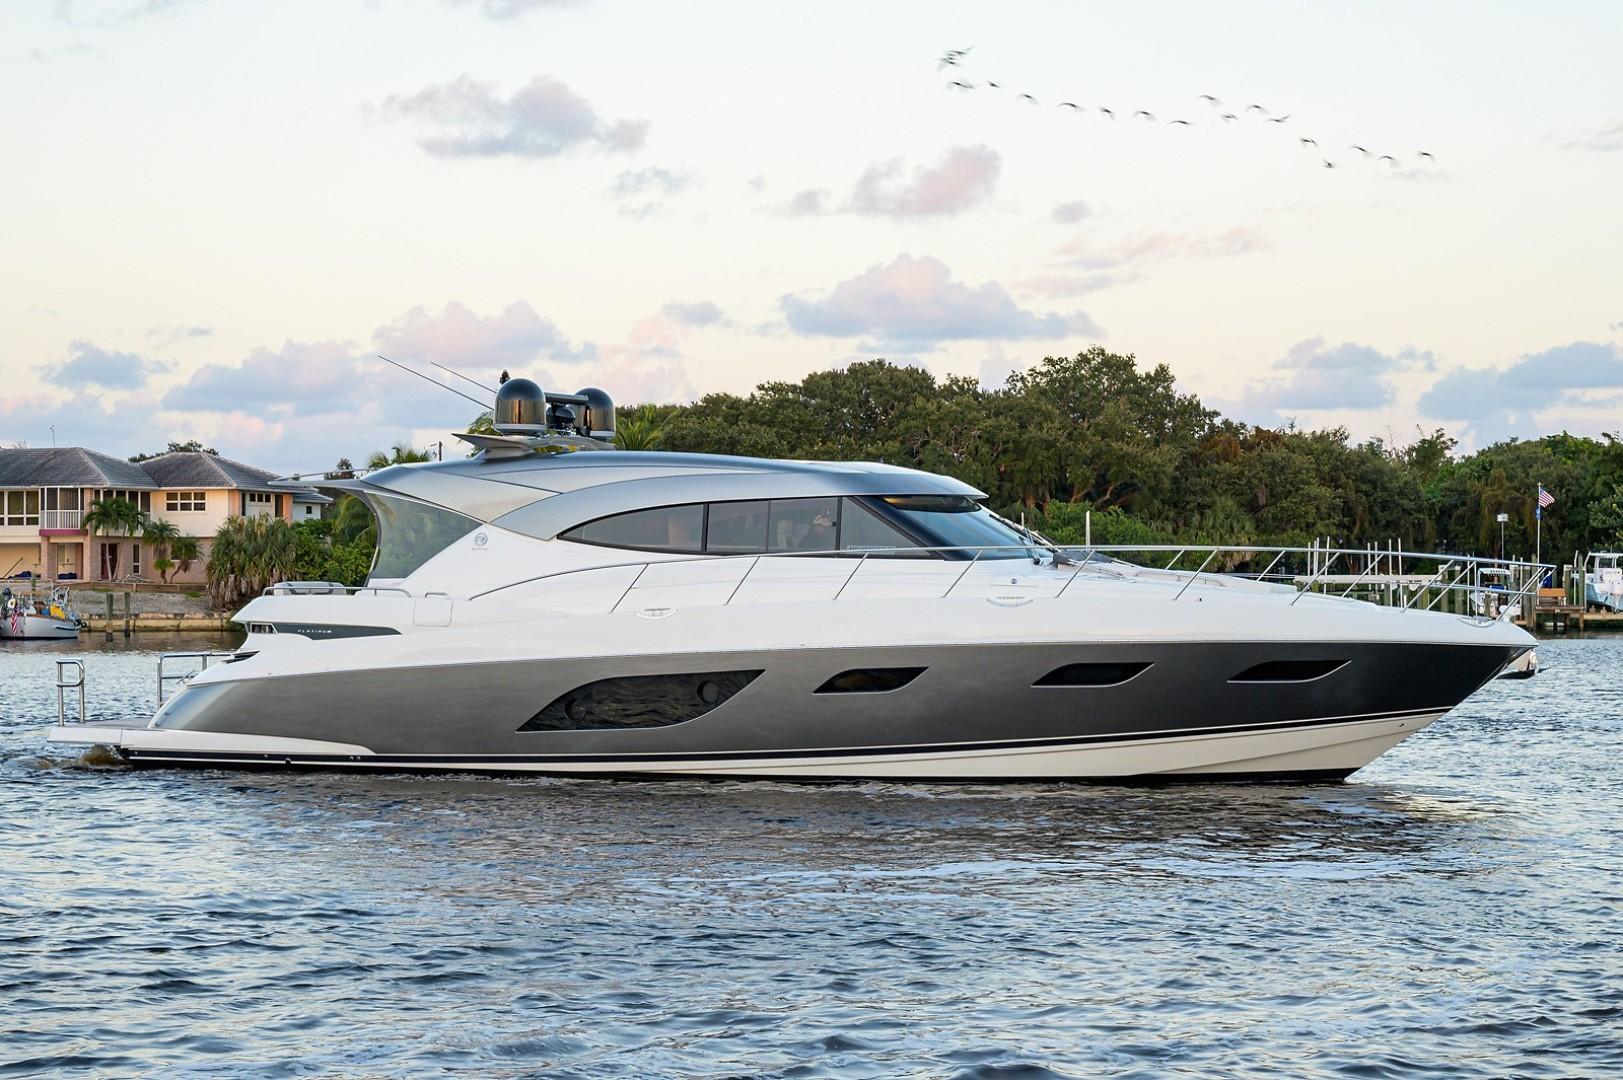 2021 Riviera 60' 6000 Sport Yacht Platinum Edition